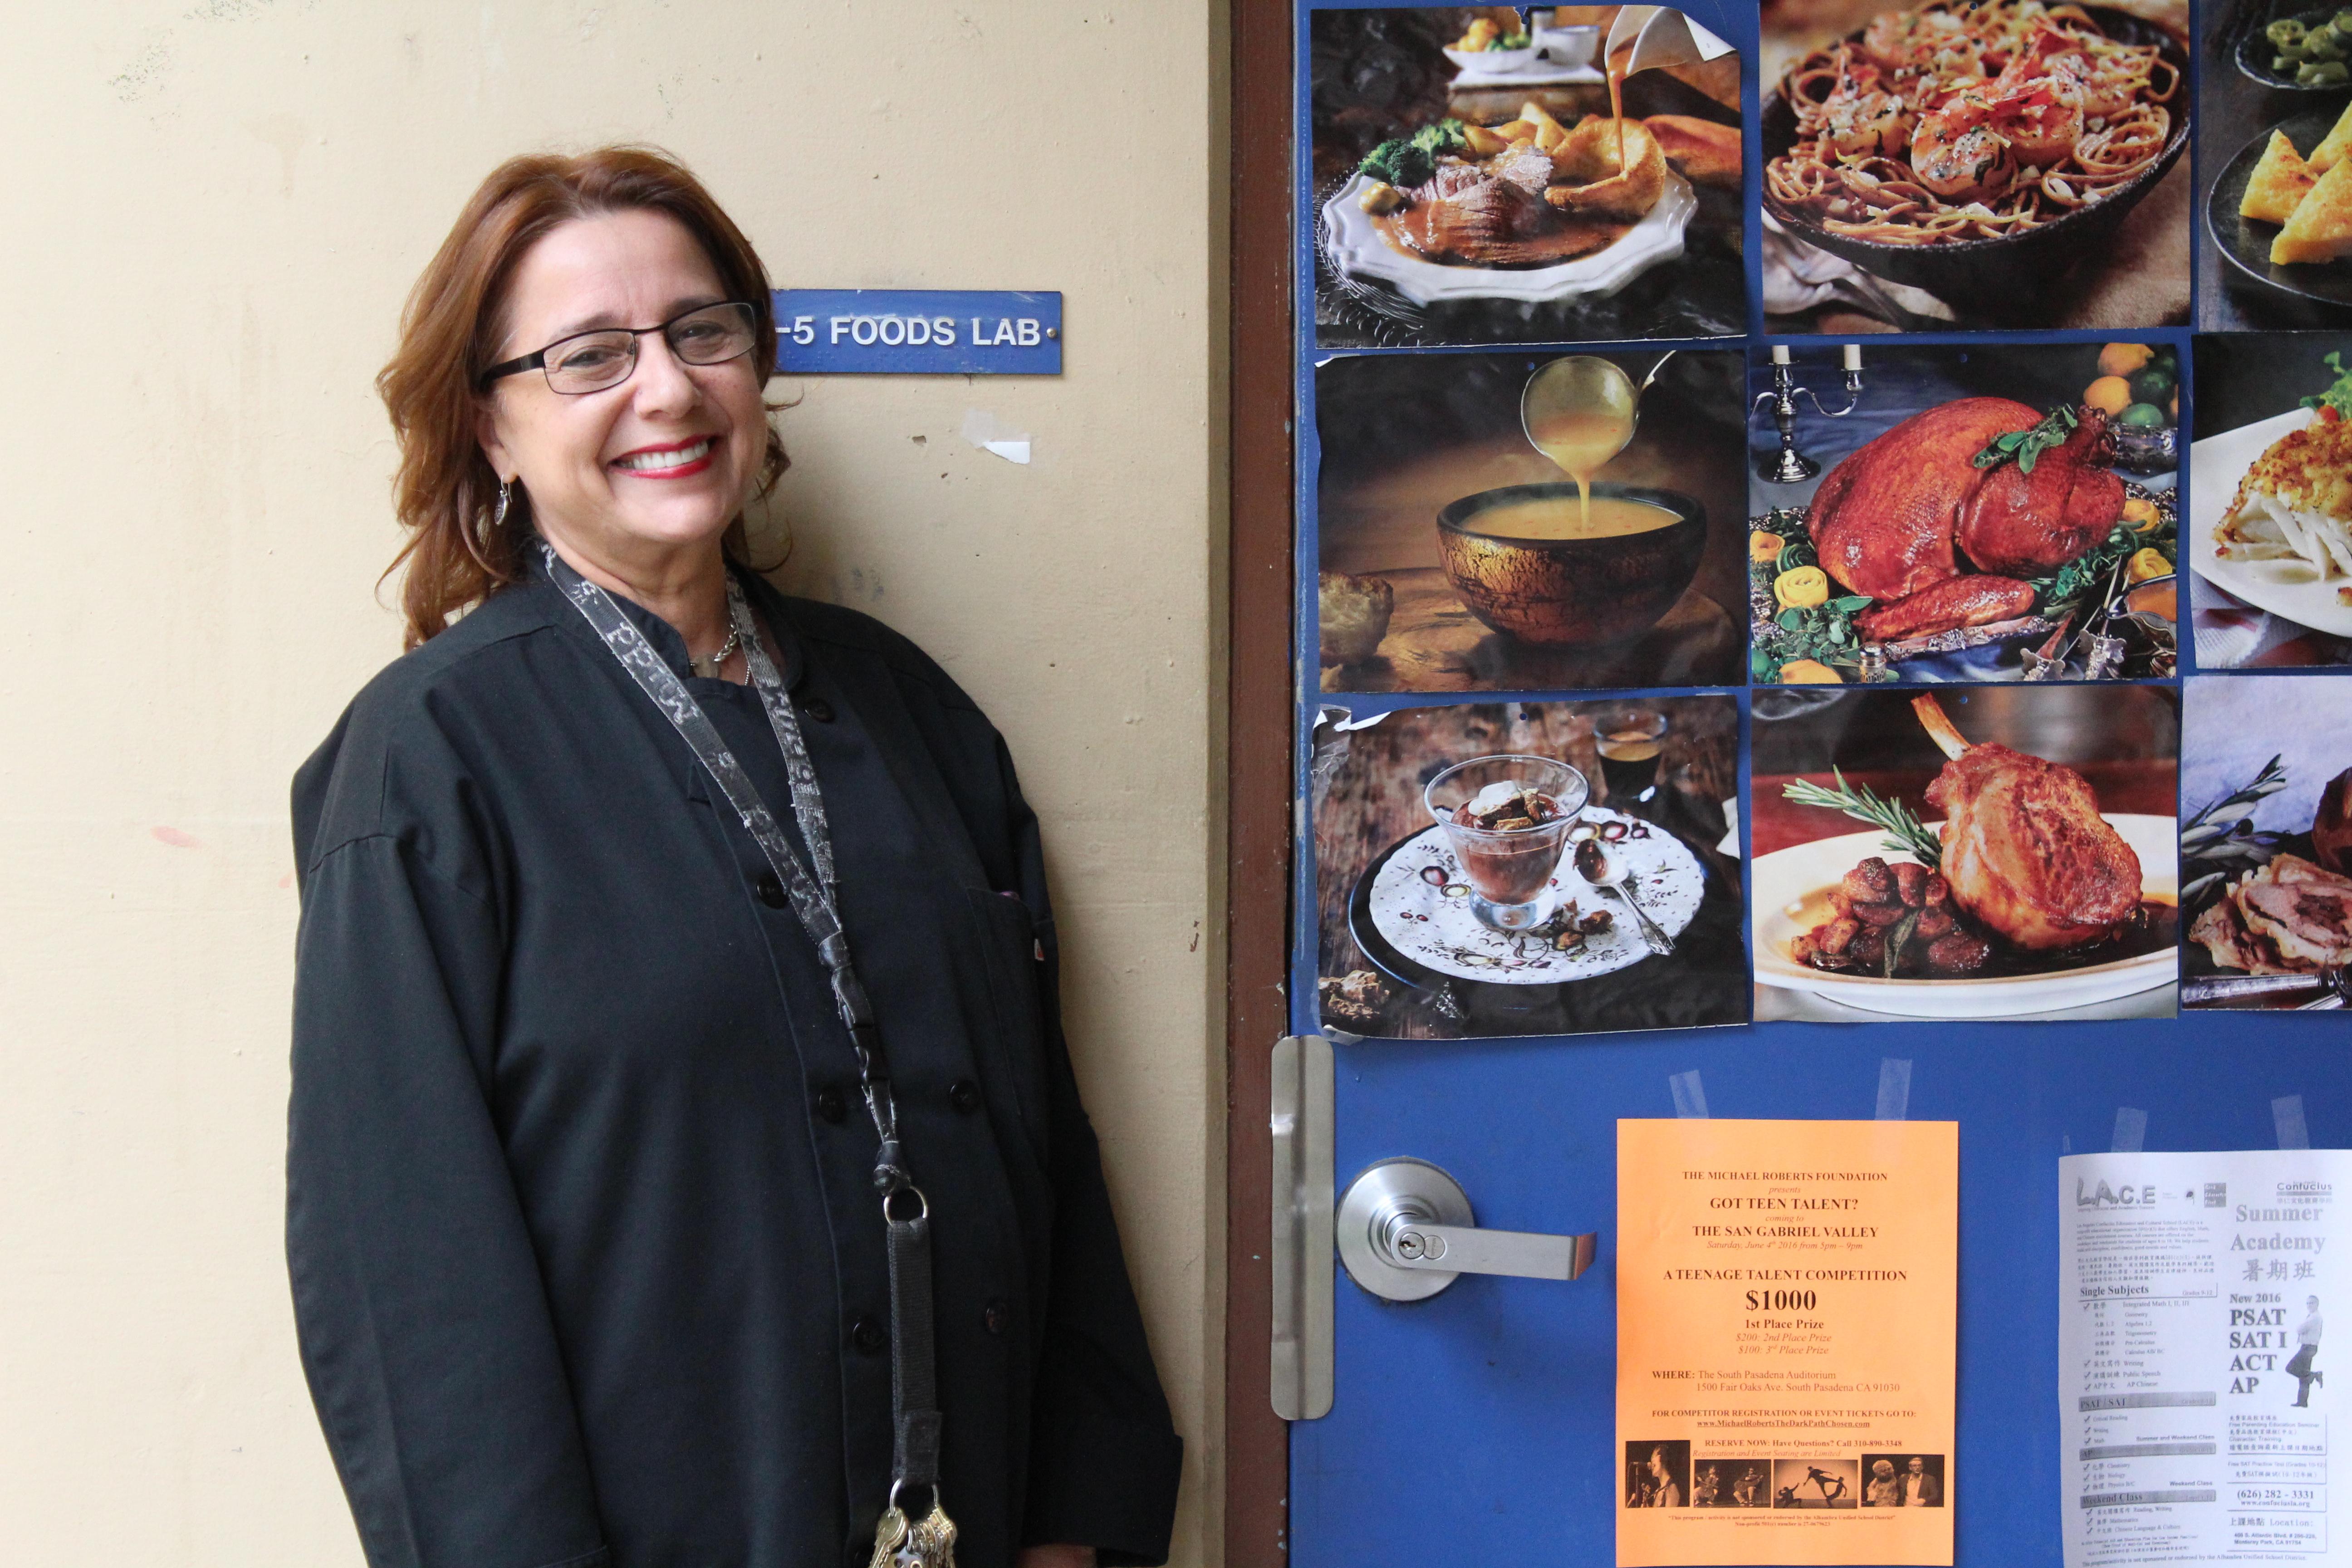 Chef Cruz retires after decades of service